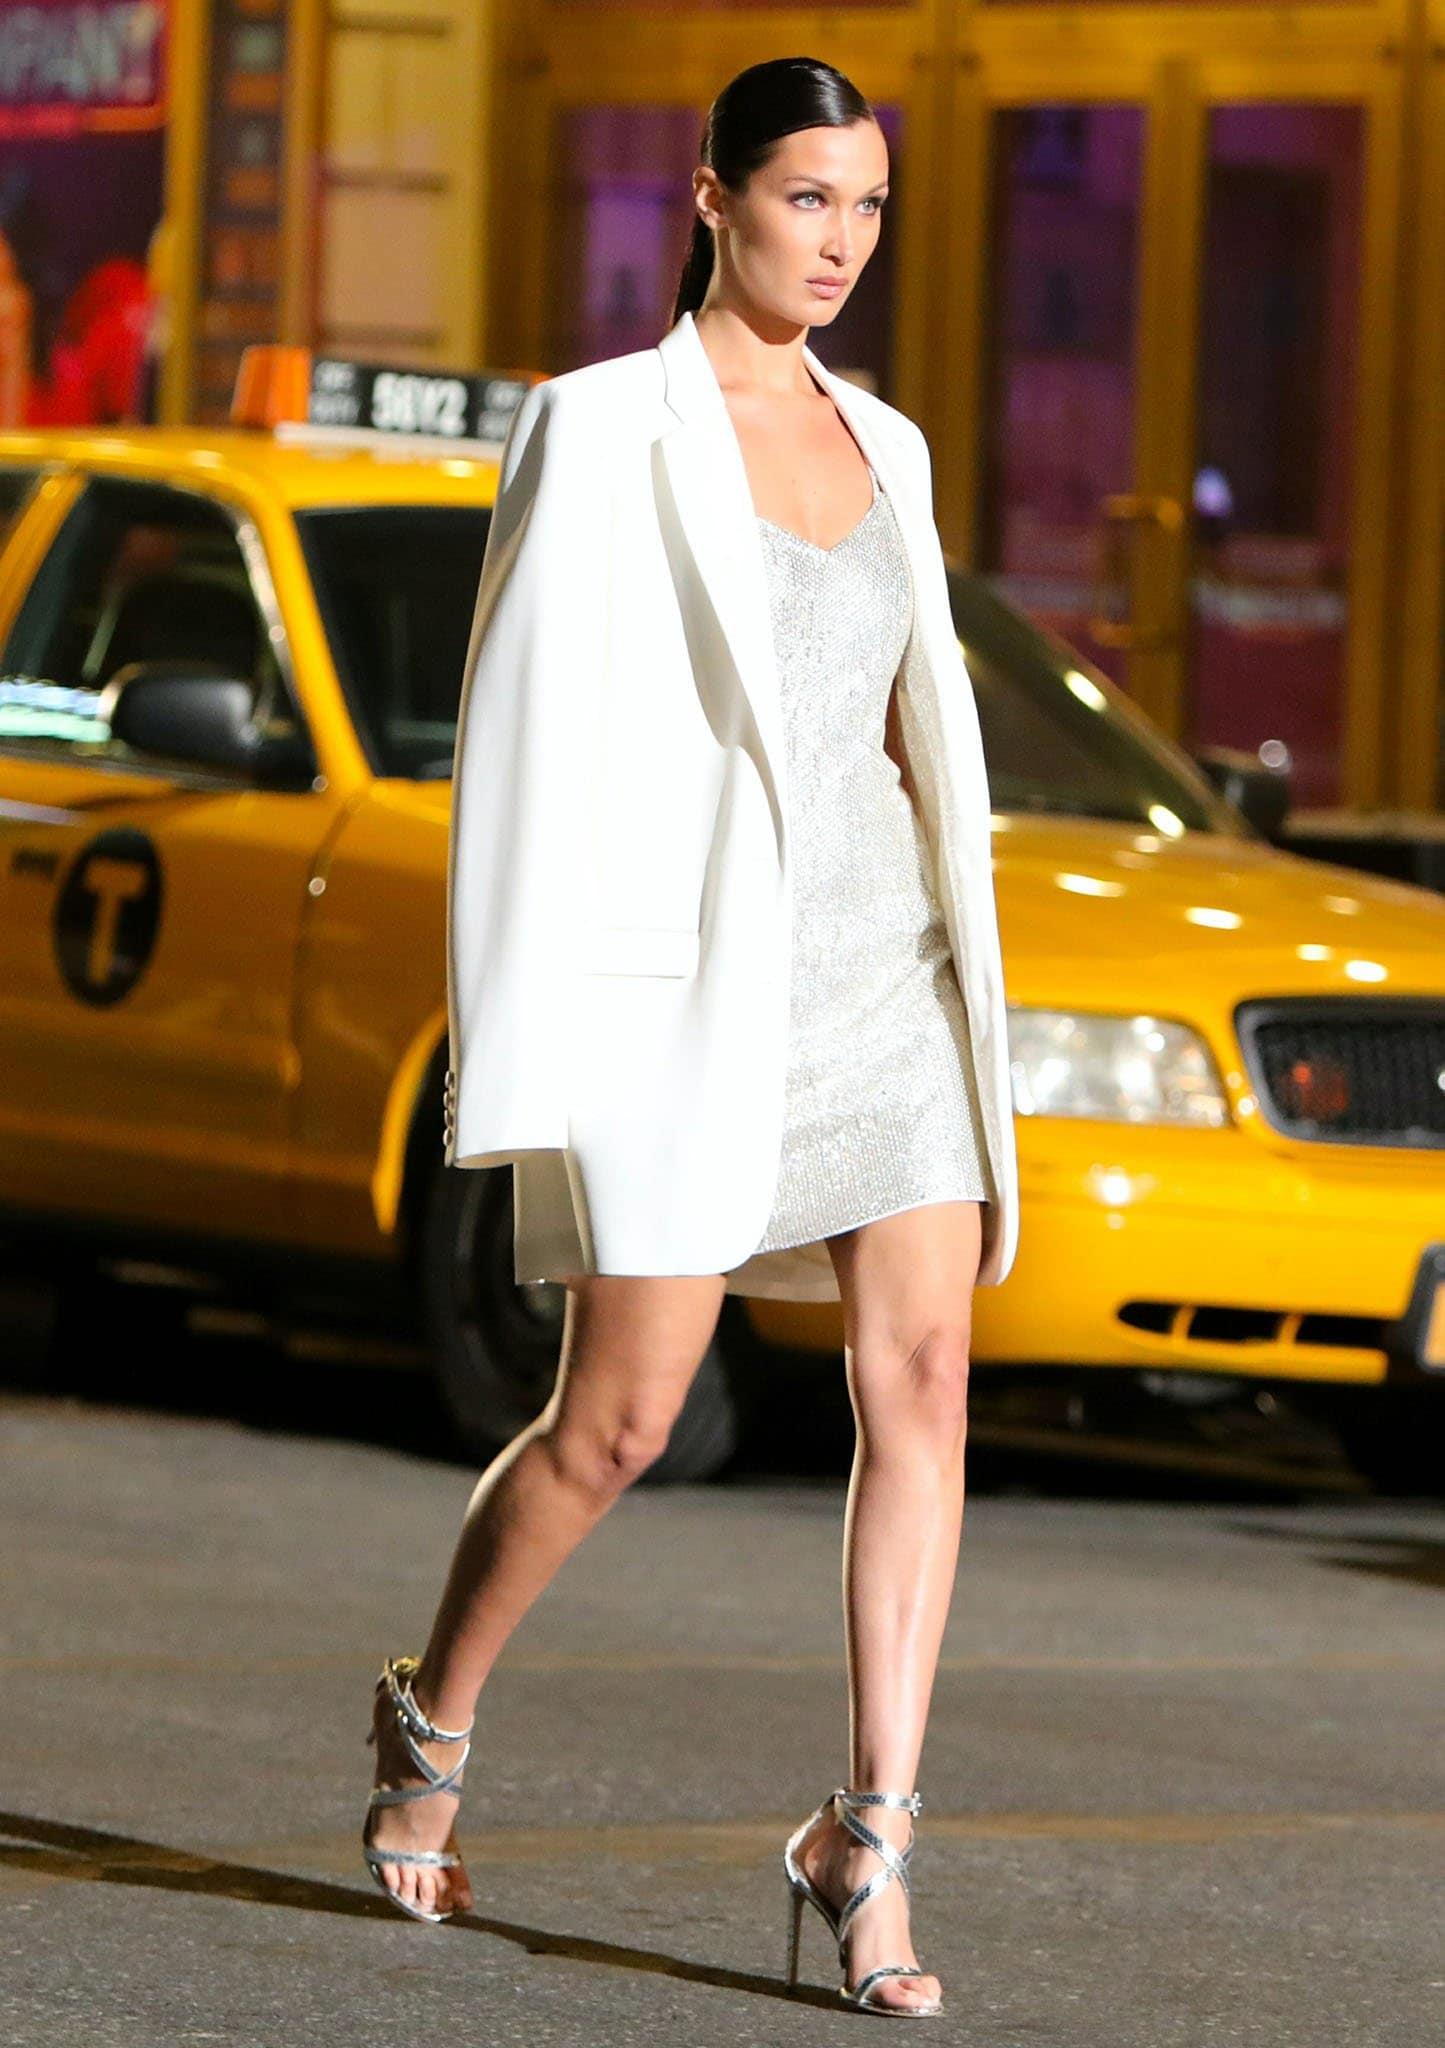 Bella Hadid models Michael Kors' sparkly white mini dress and oversized white blazer